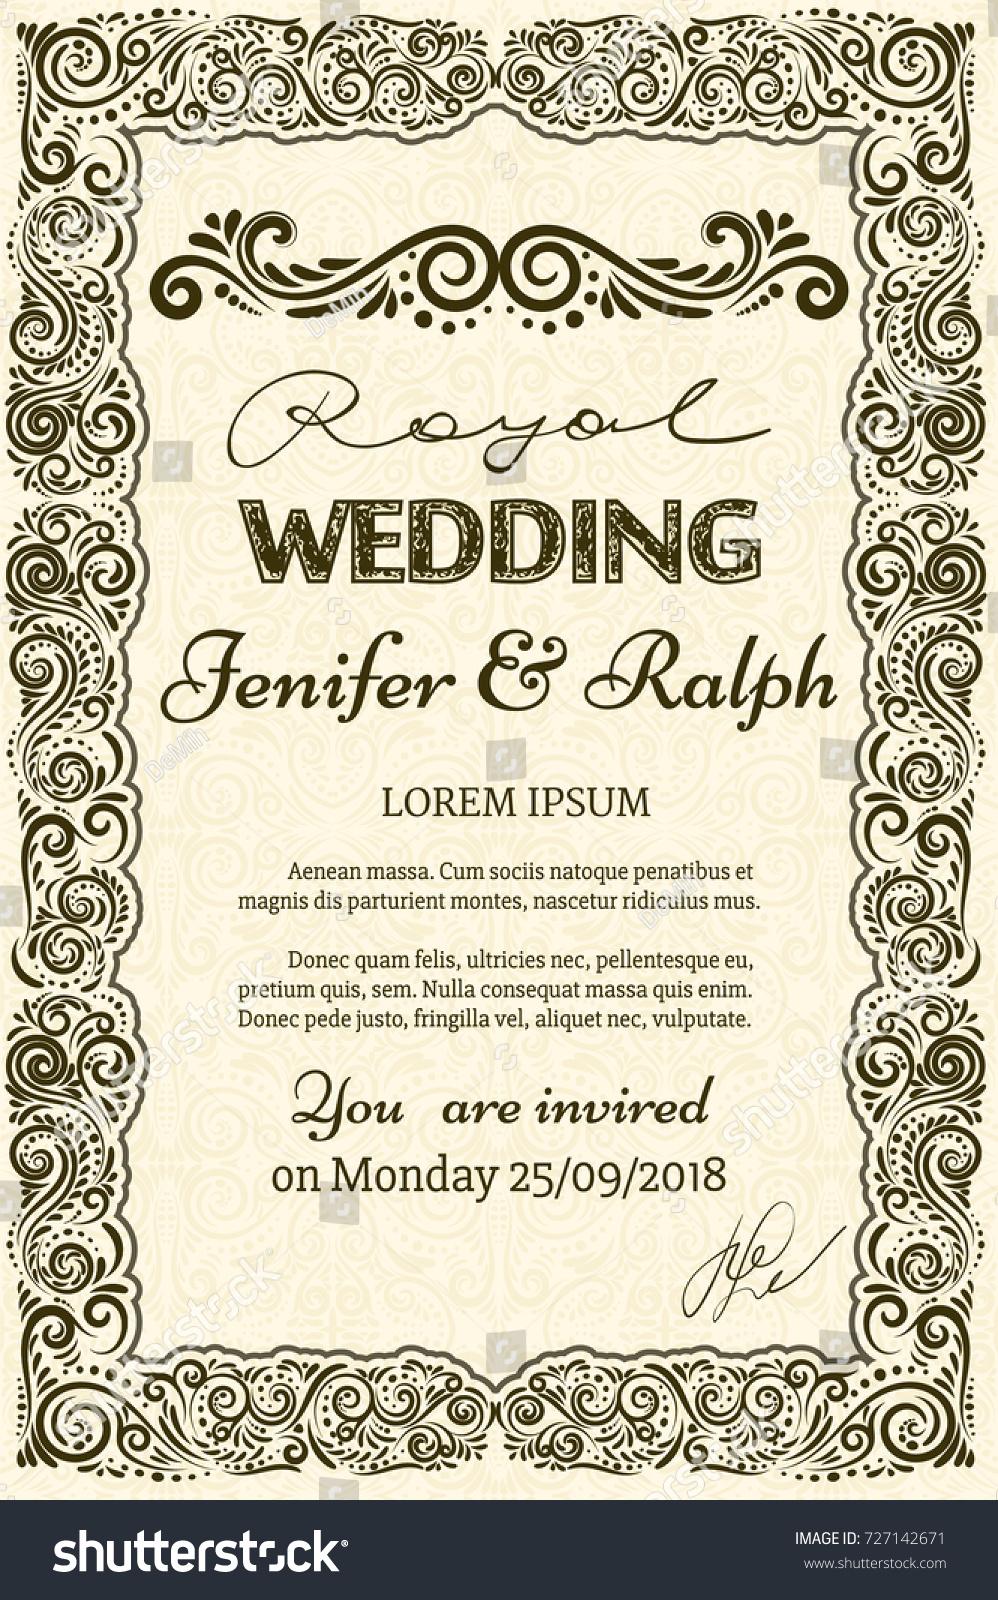 Classic Vintage Wedding Card Elegant Classic Stock Photo (Photo ...